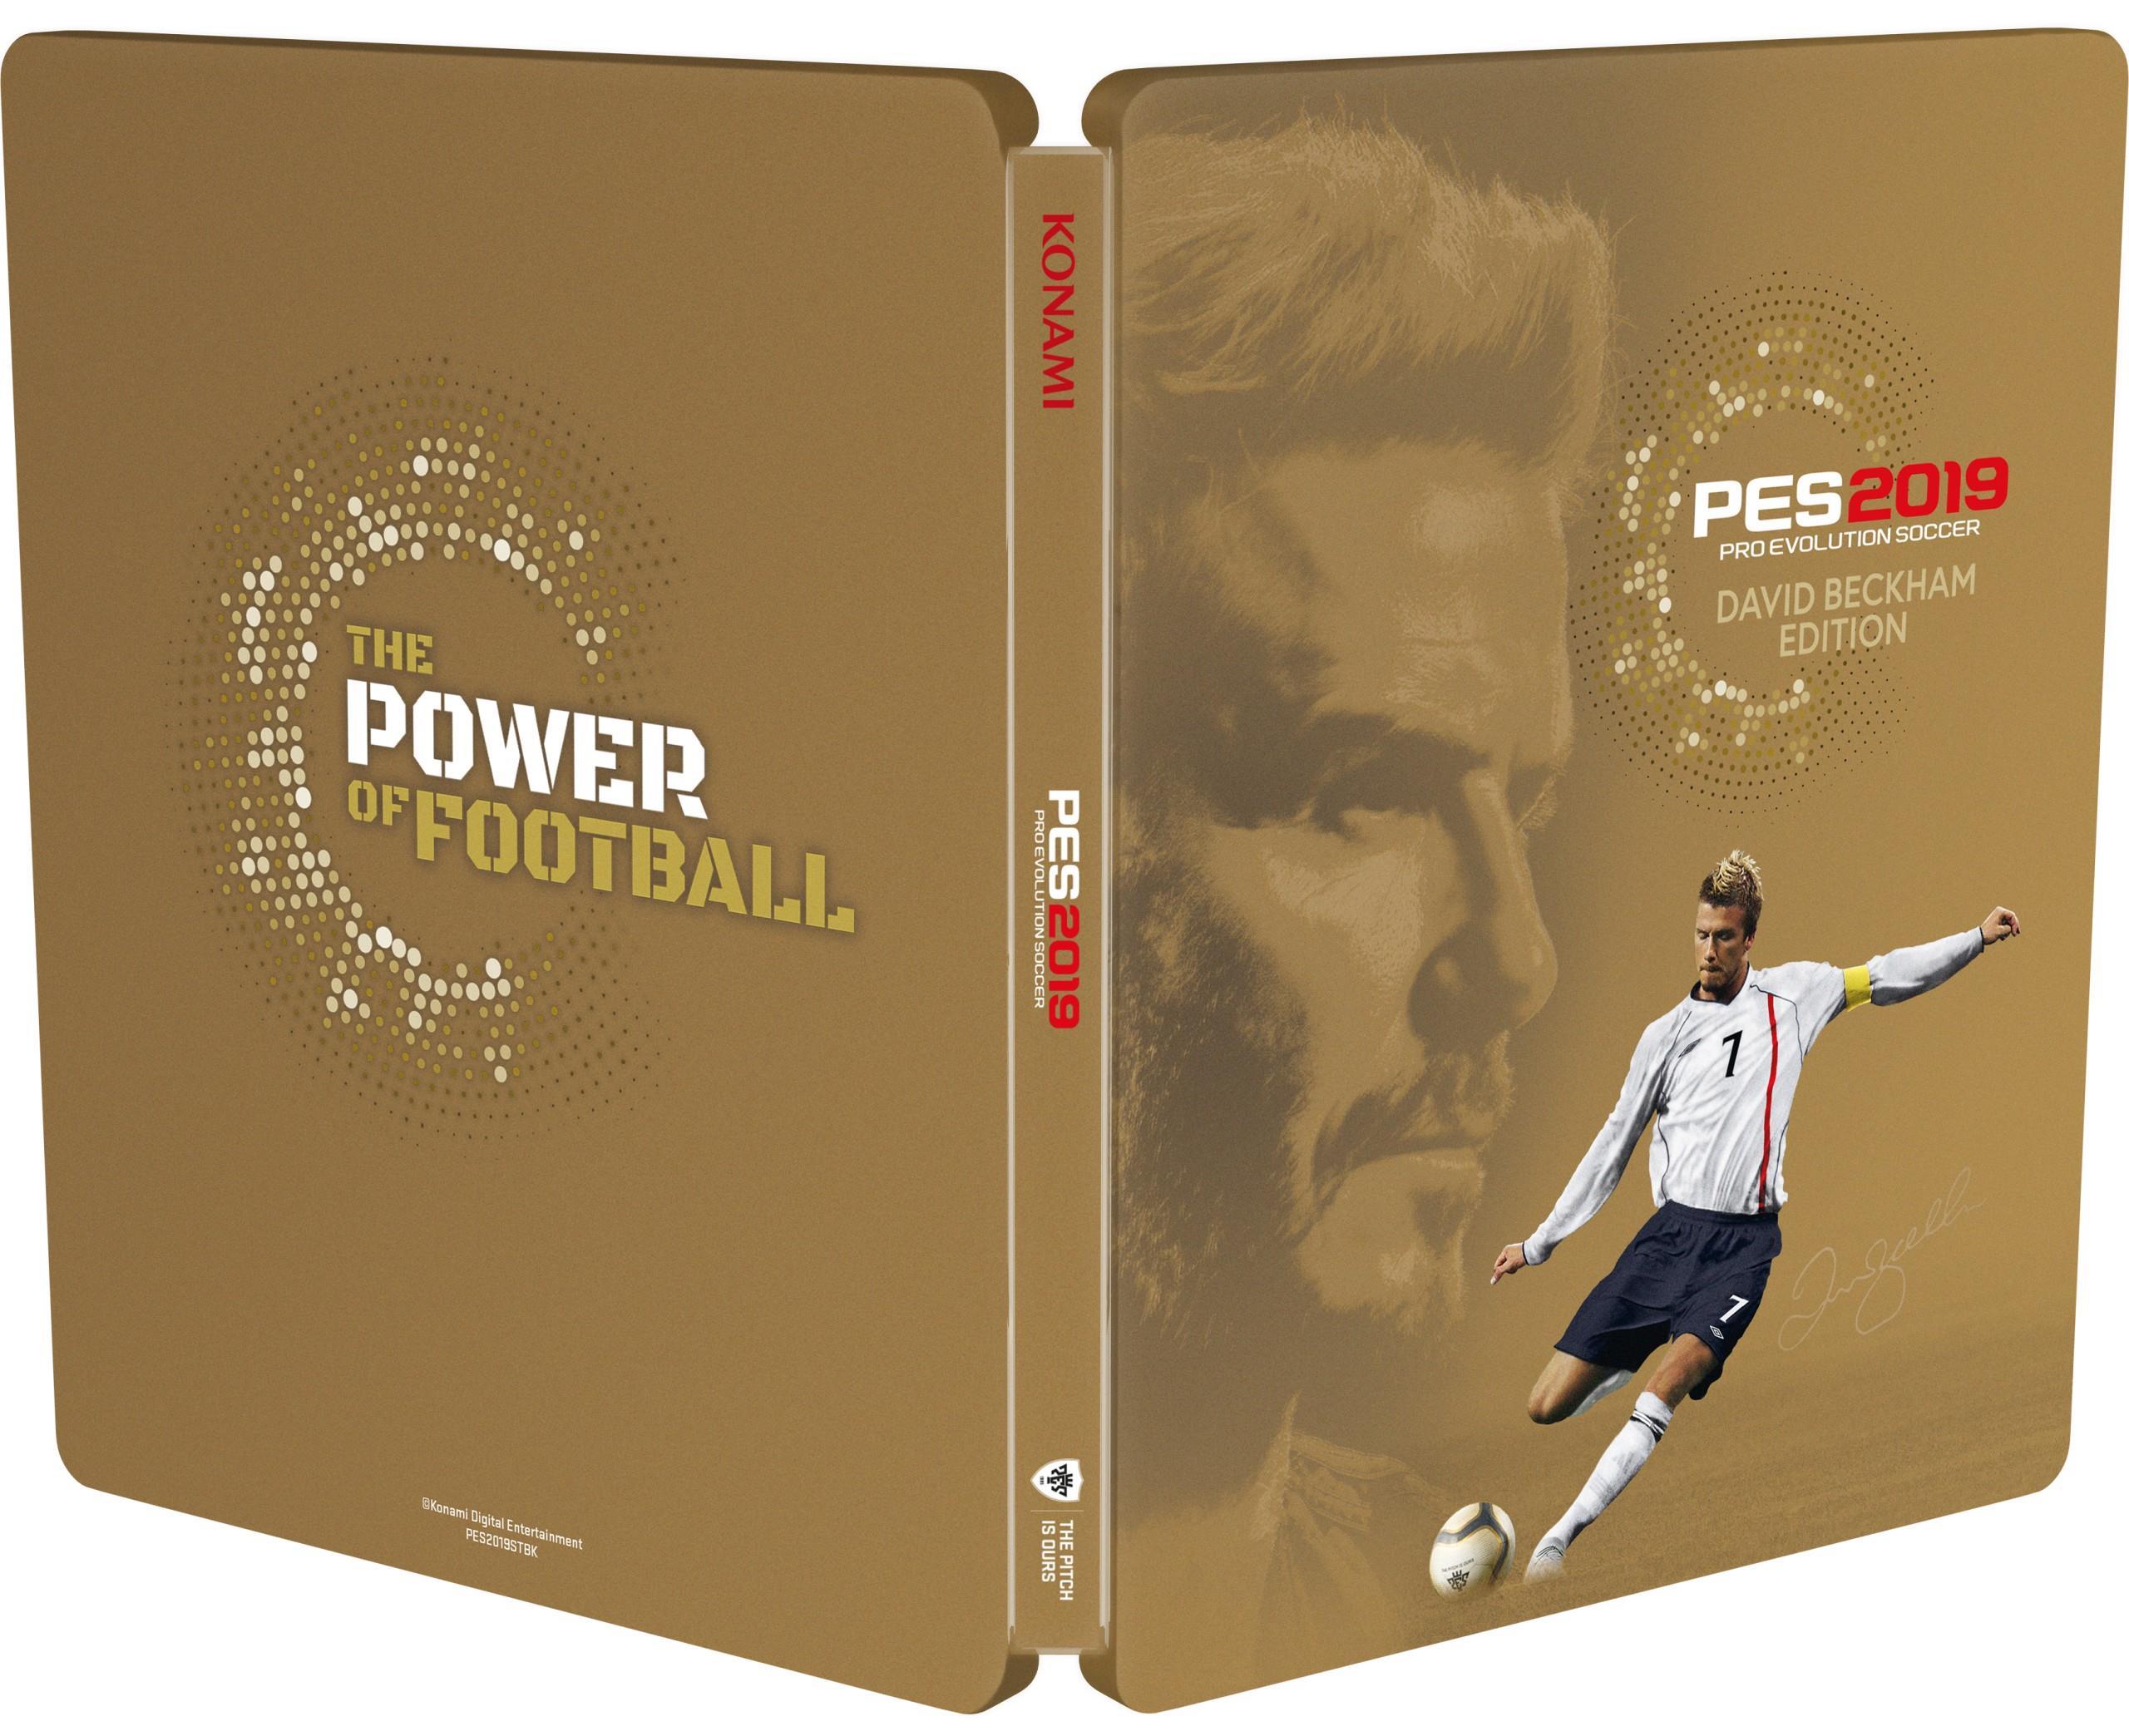 Konami Pro Evolution Soccer 2019 David Beckham Edition (PS4)